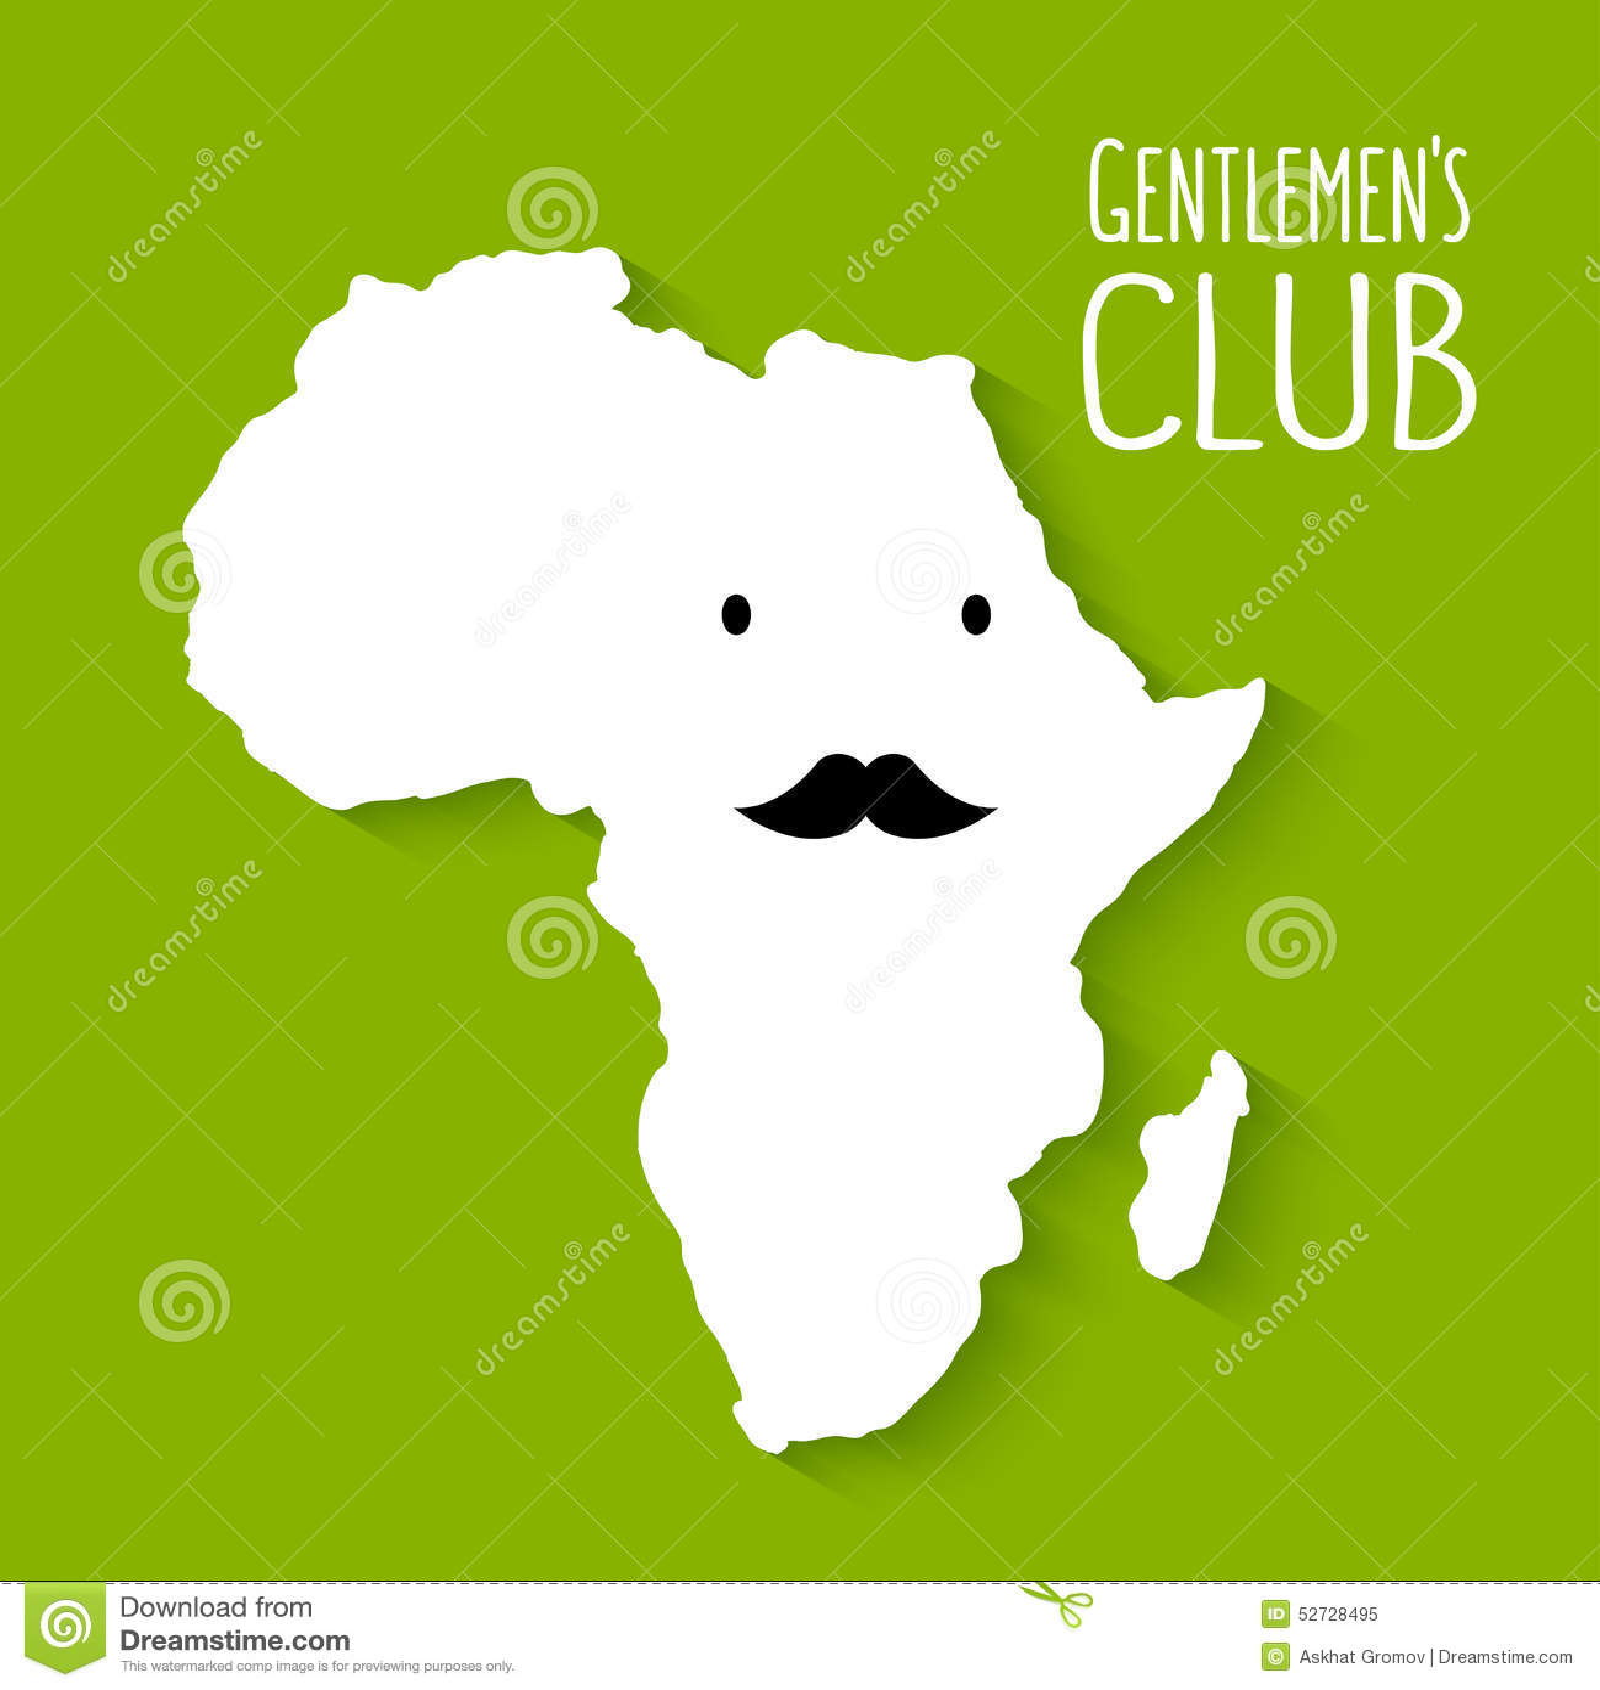 Fun Moustache Flat Cartoon Africa Map Gentleman Stock Vector